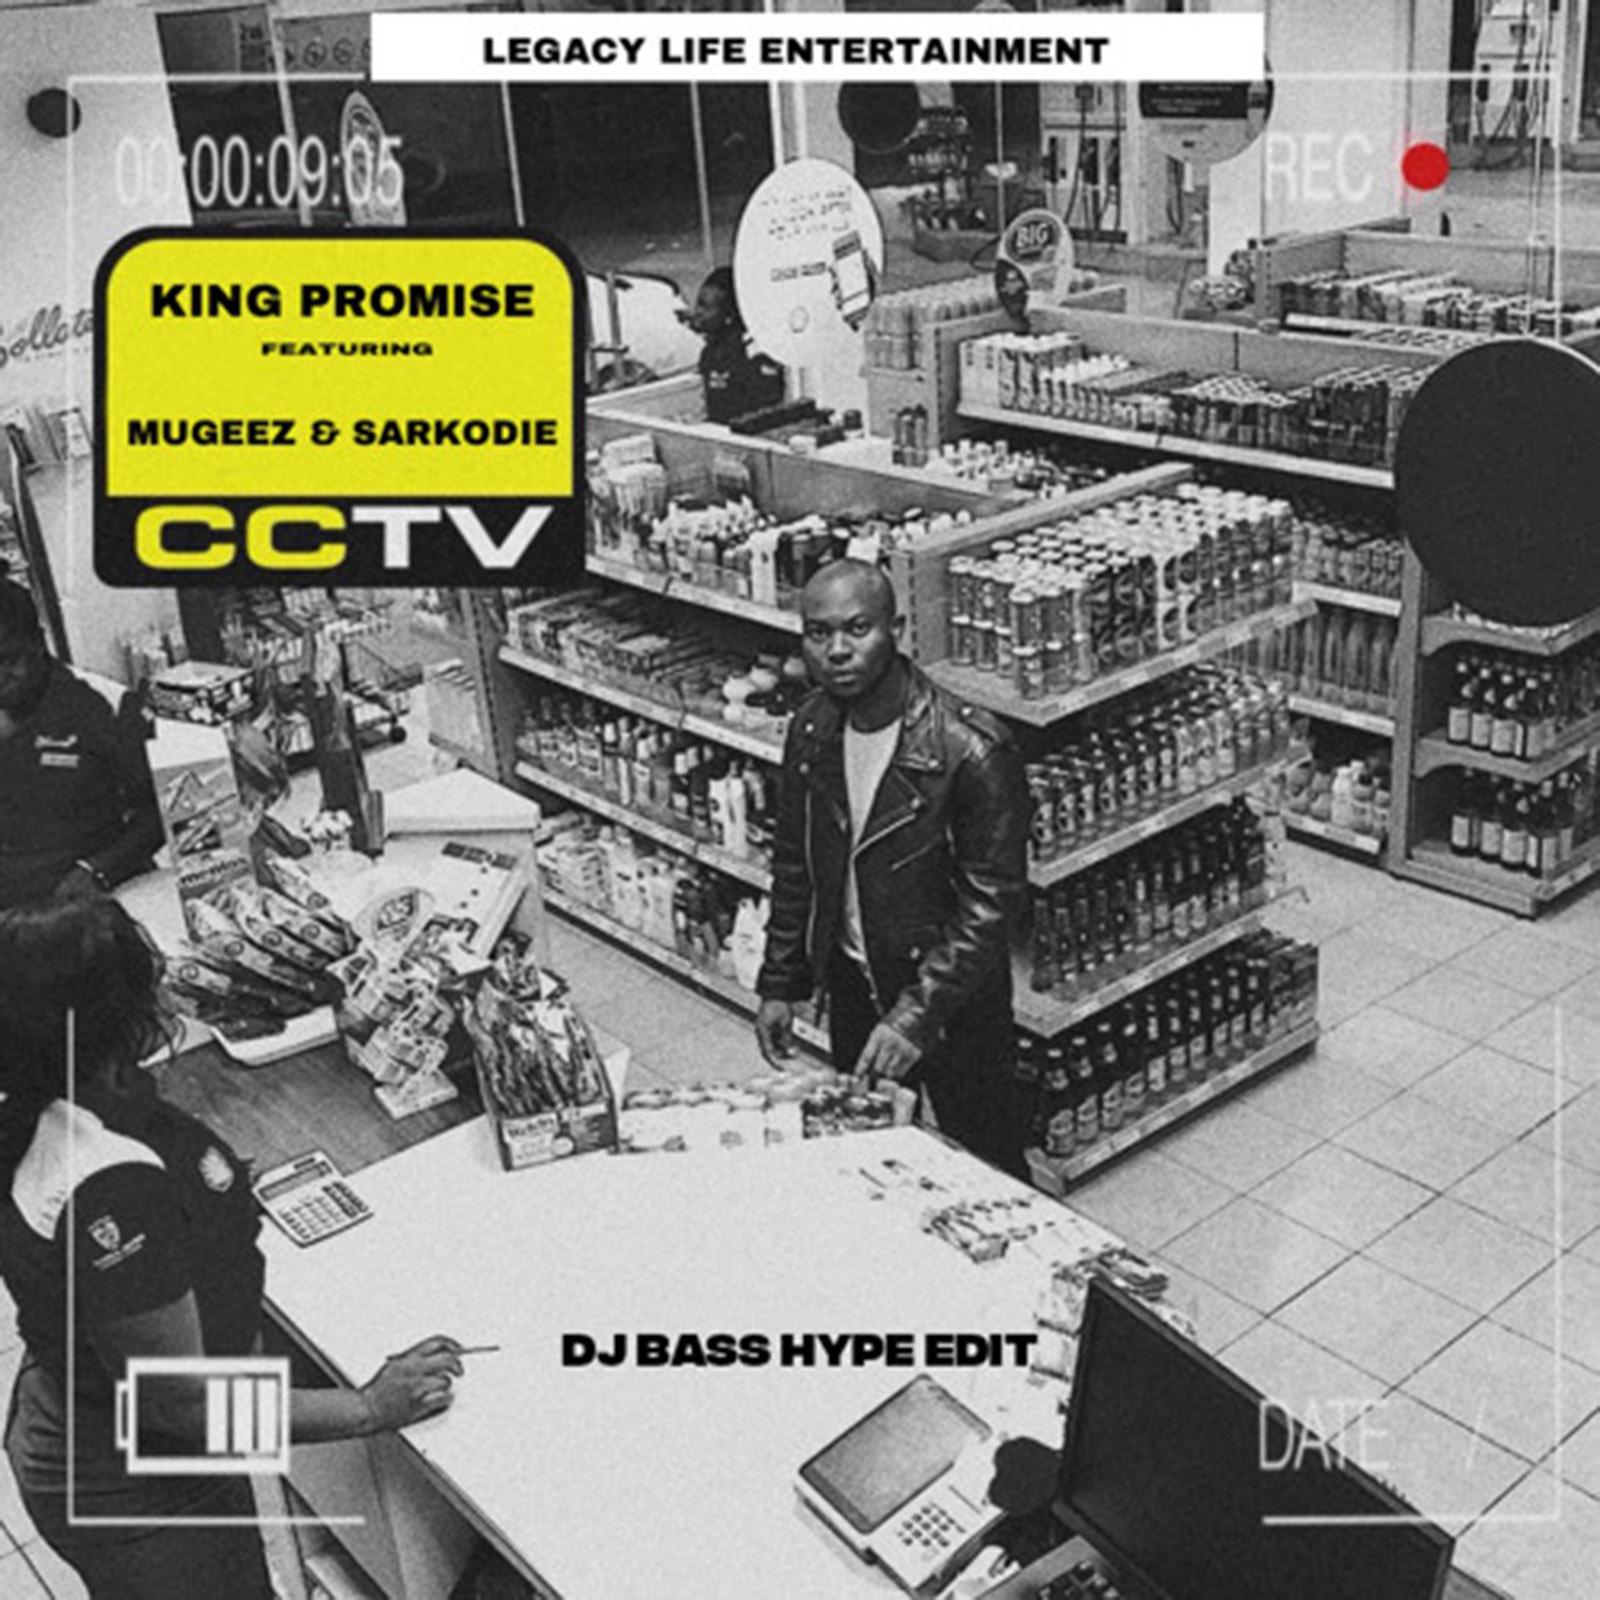 CCTV by DJ Bass